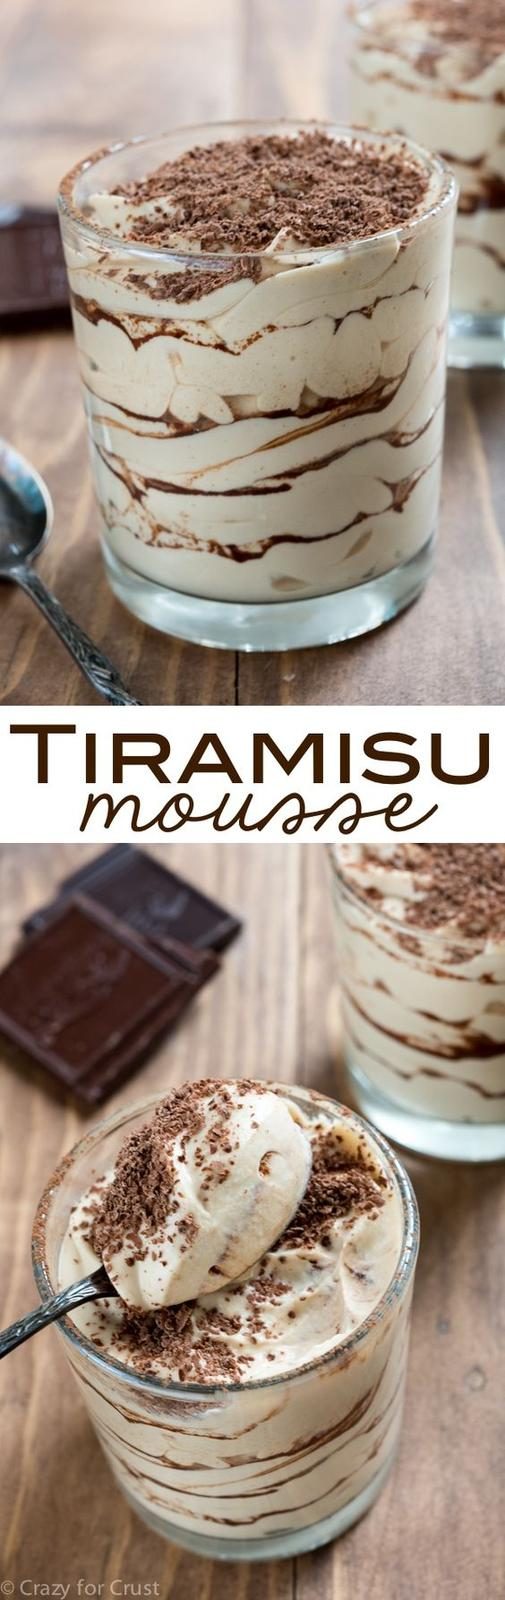 Americké koláčky - Easy Tiramisu Mousse